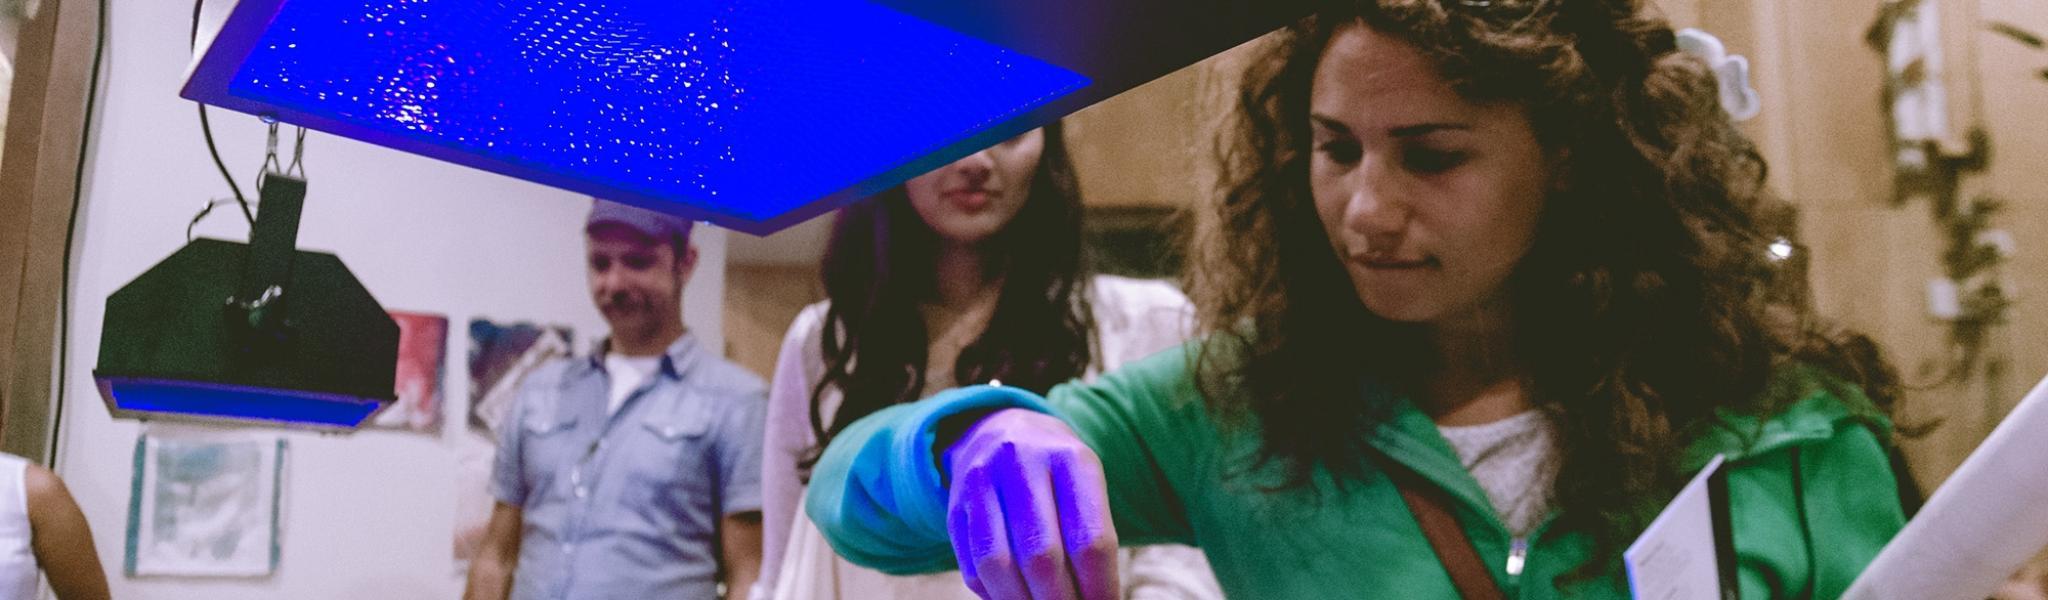 How to Print Inkodye with UV Light